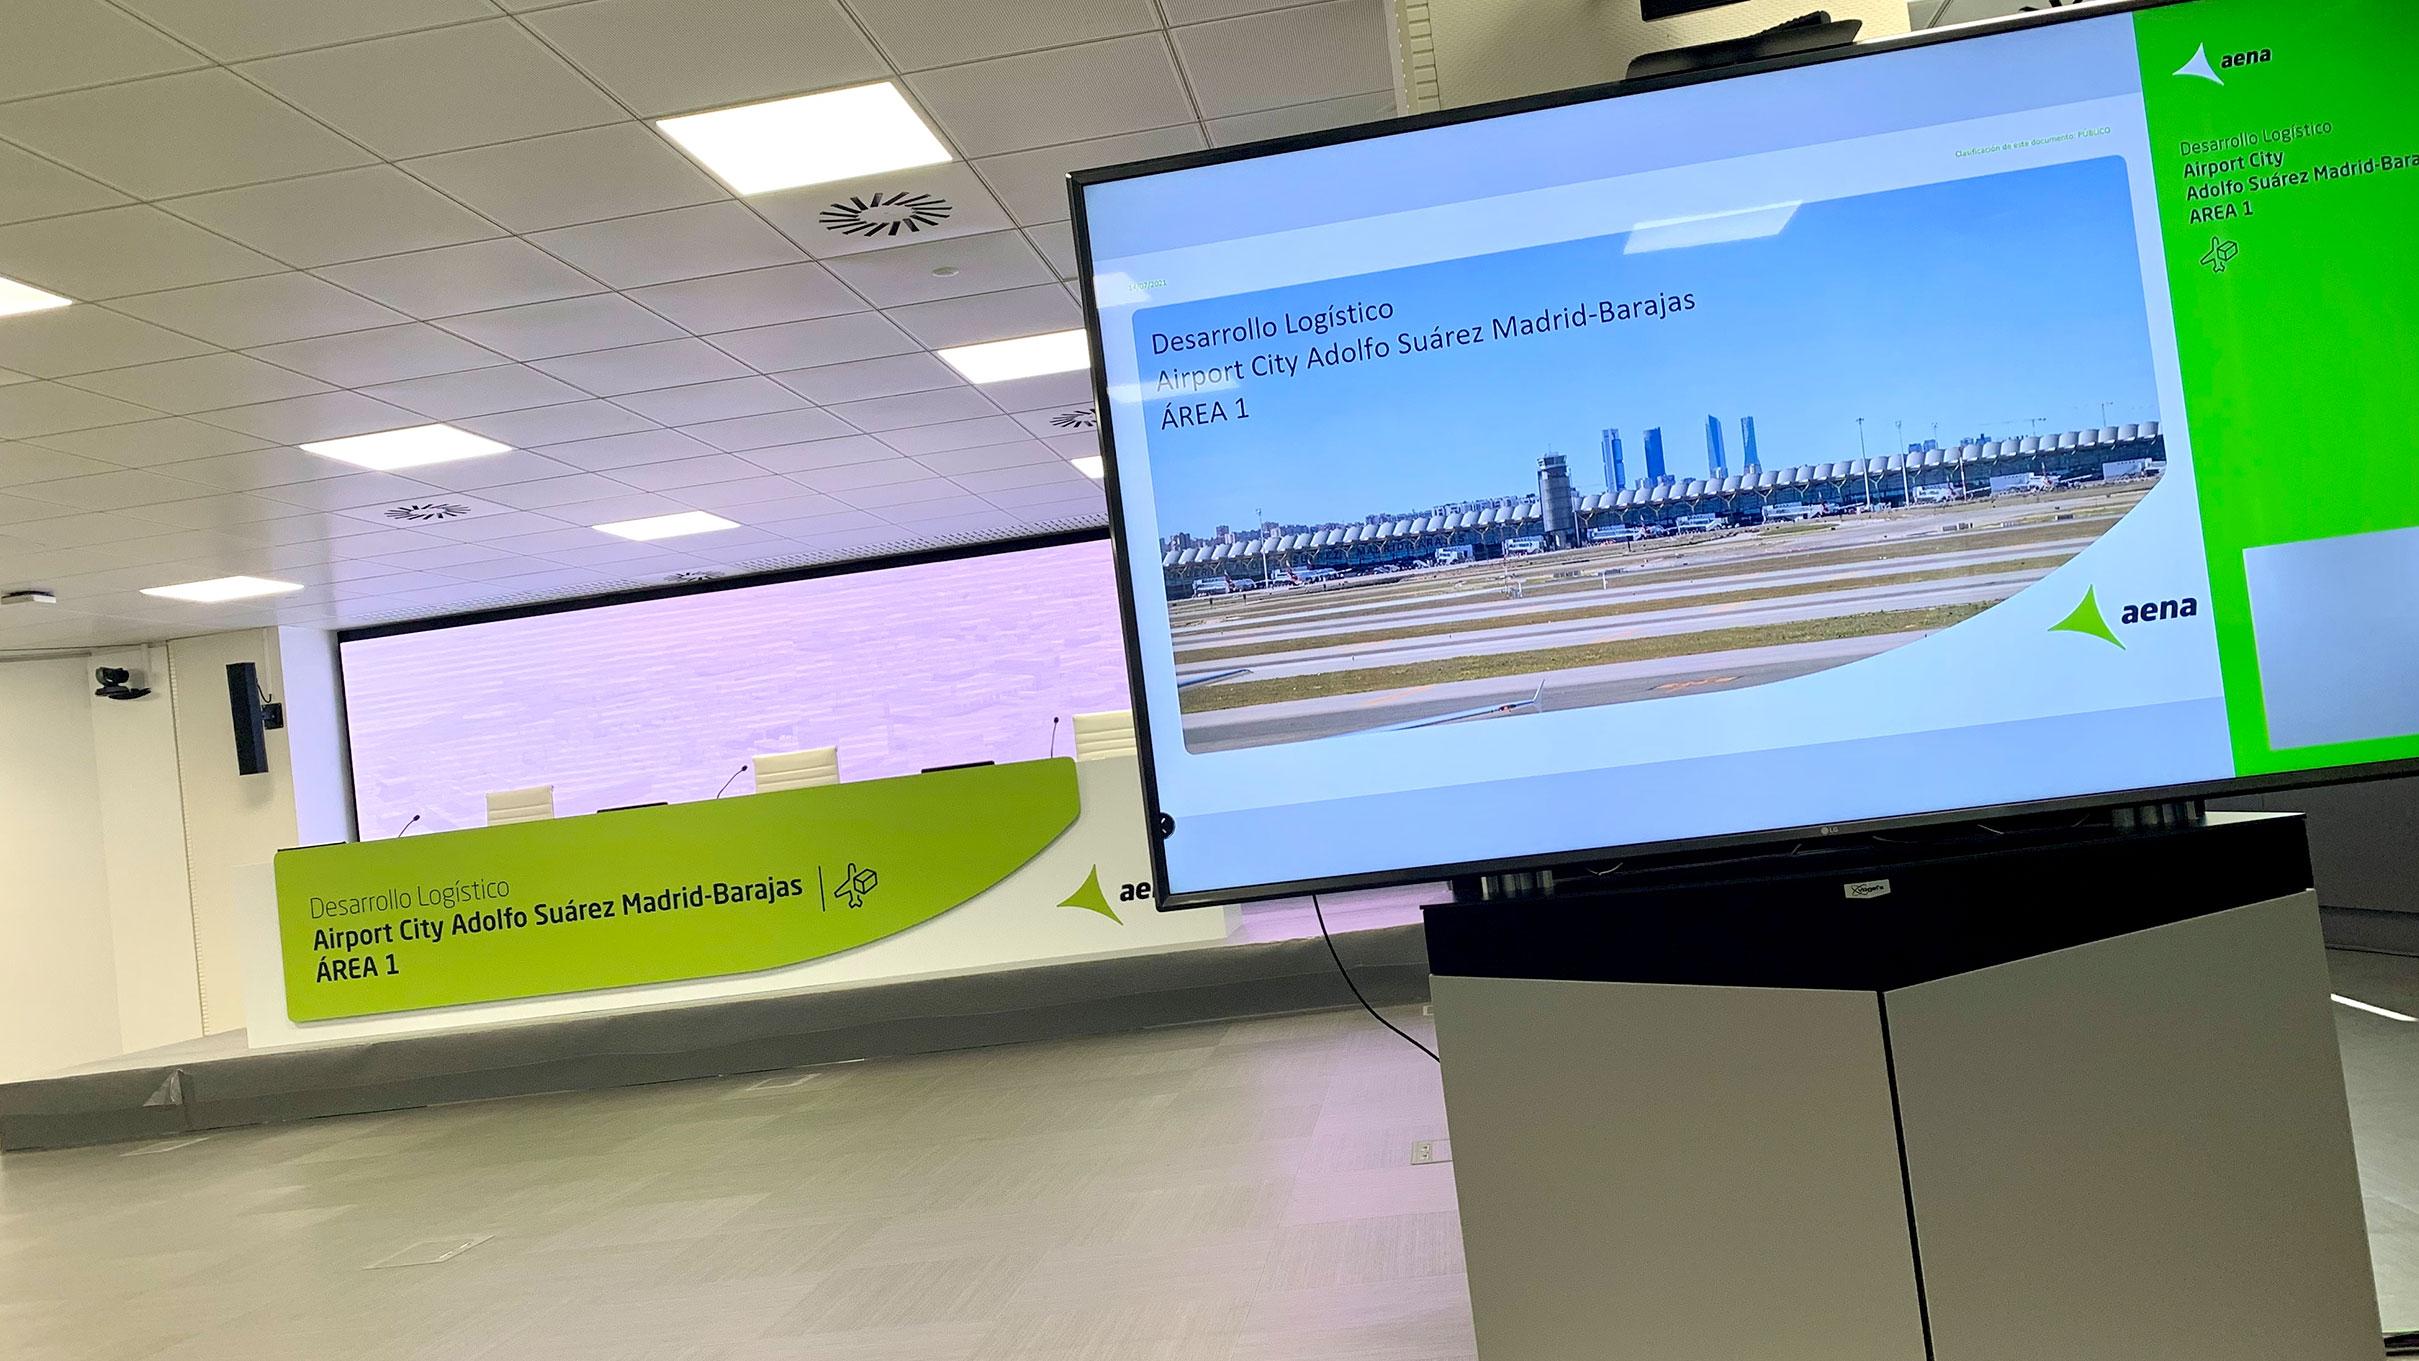 aena-airportcity-barajas-2021_09